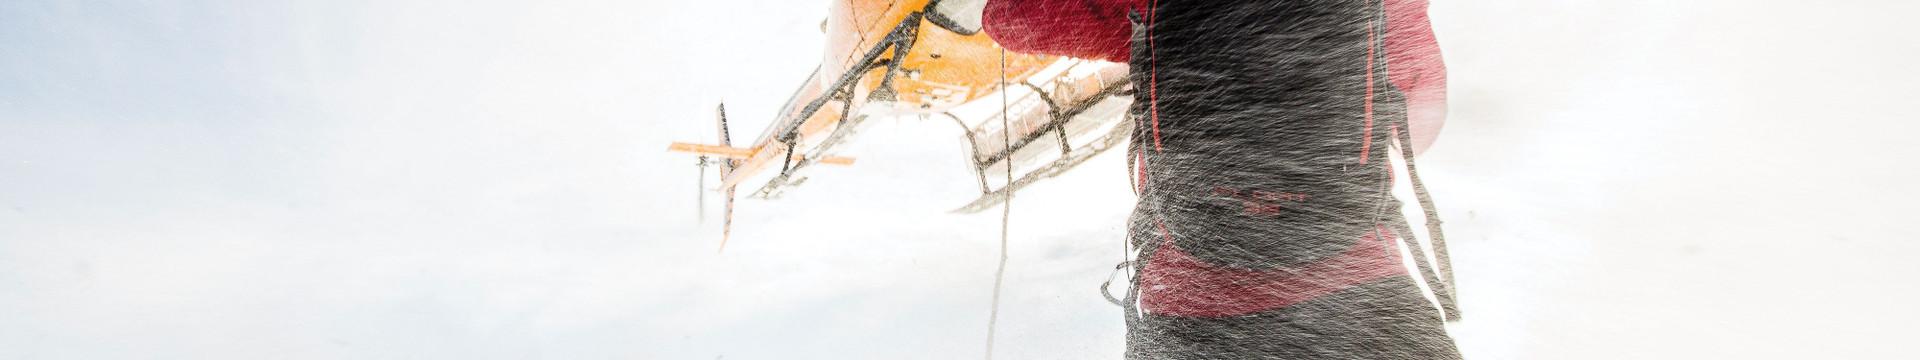 Helicopter Skiiing near our Park City, Utah Hotel and Ski Resort   Heli-Ski Trips